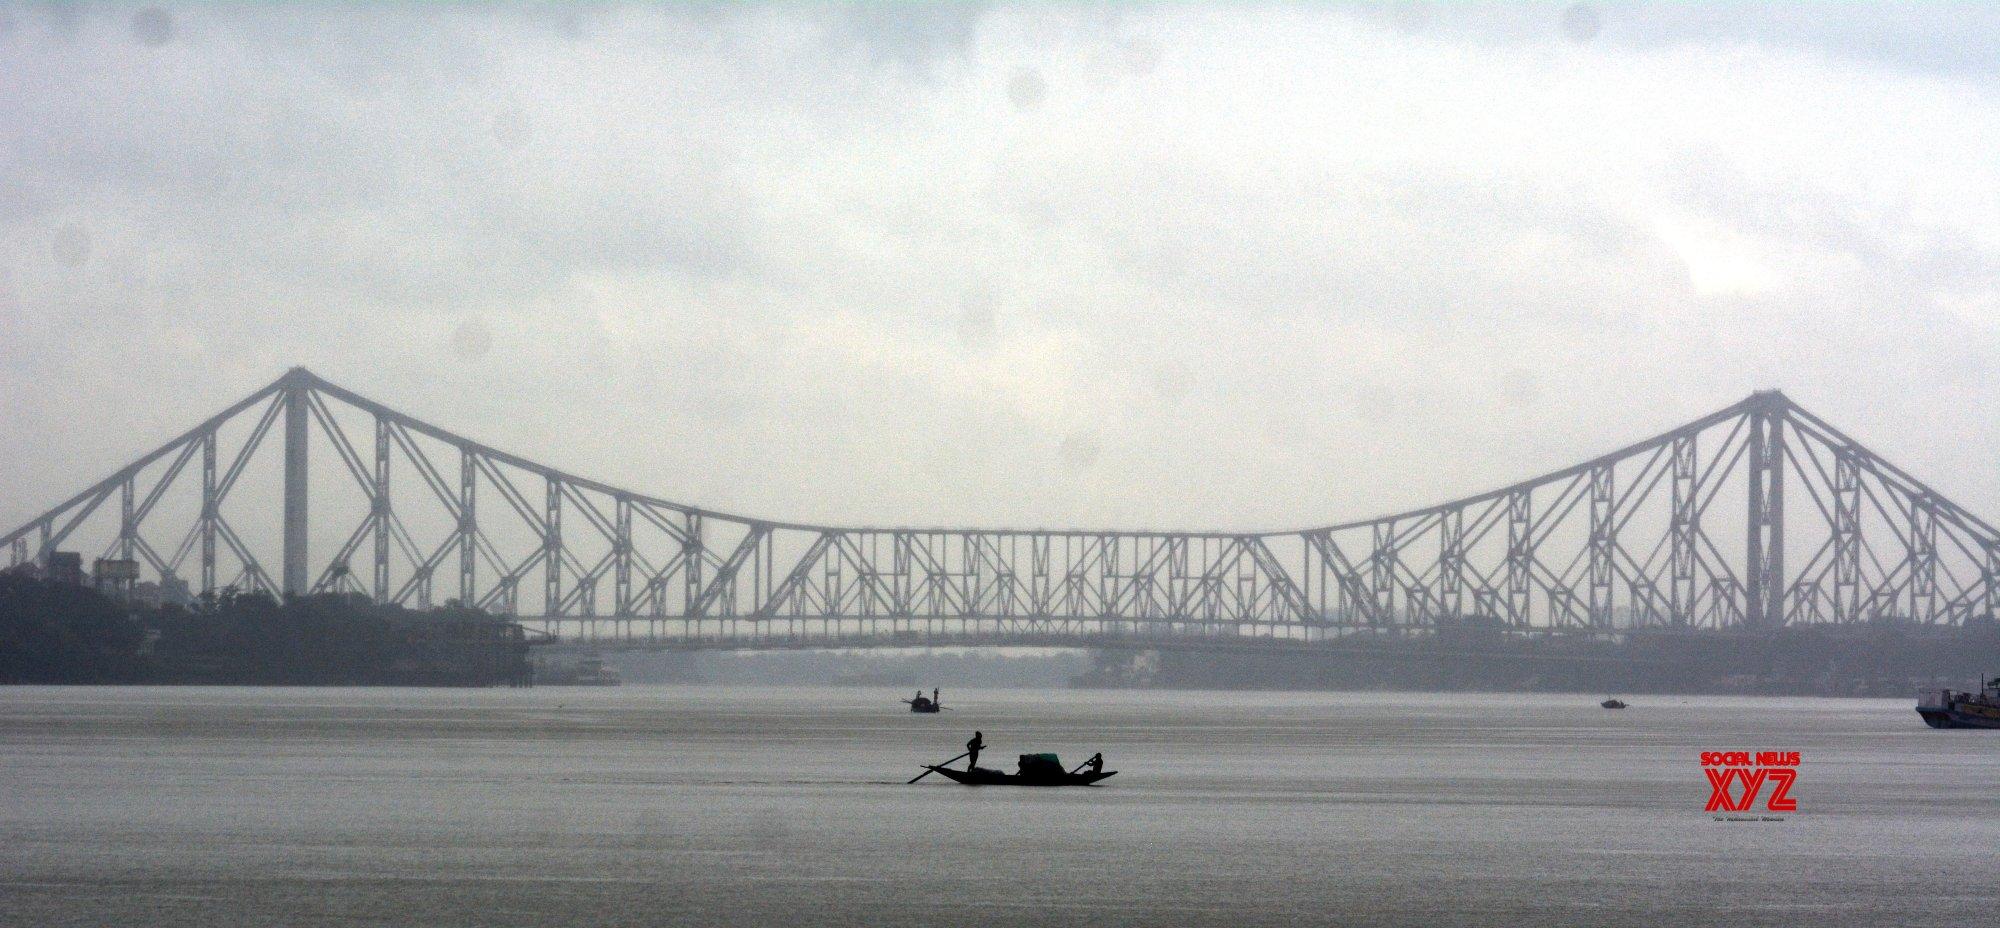 Kolkata: The sky is covered with clouds and rain over the river - Ganga - in Kolkata #Gallery